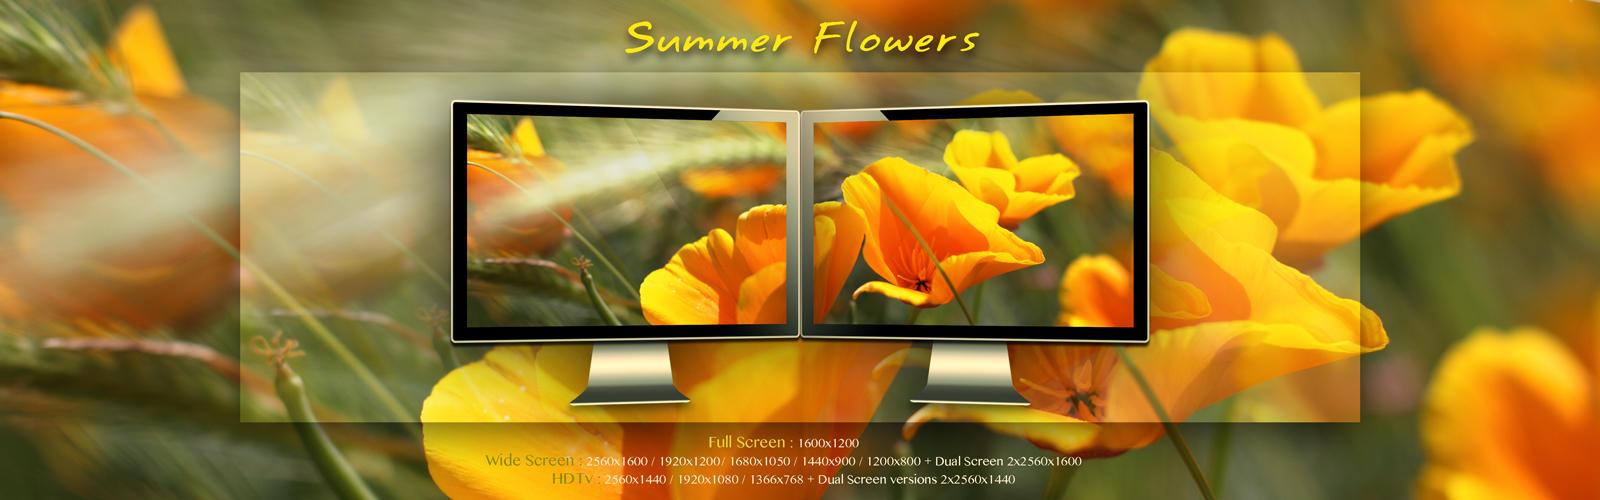 Summer Flowers Wallpaper Pack by Pierre-Lagarde